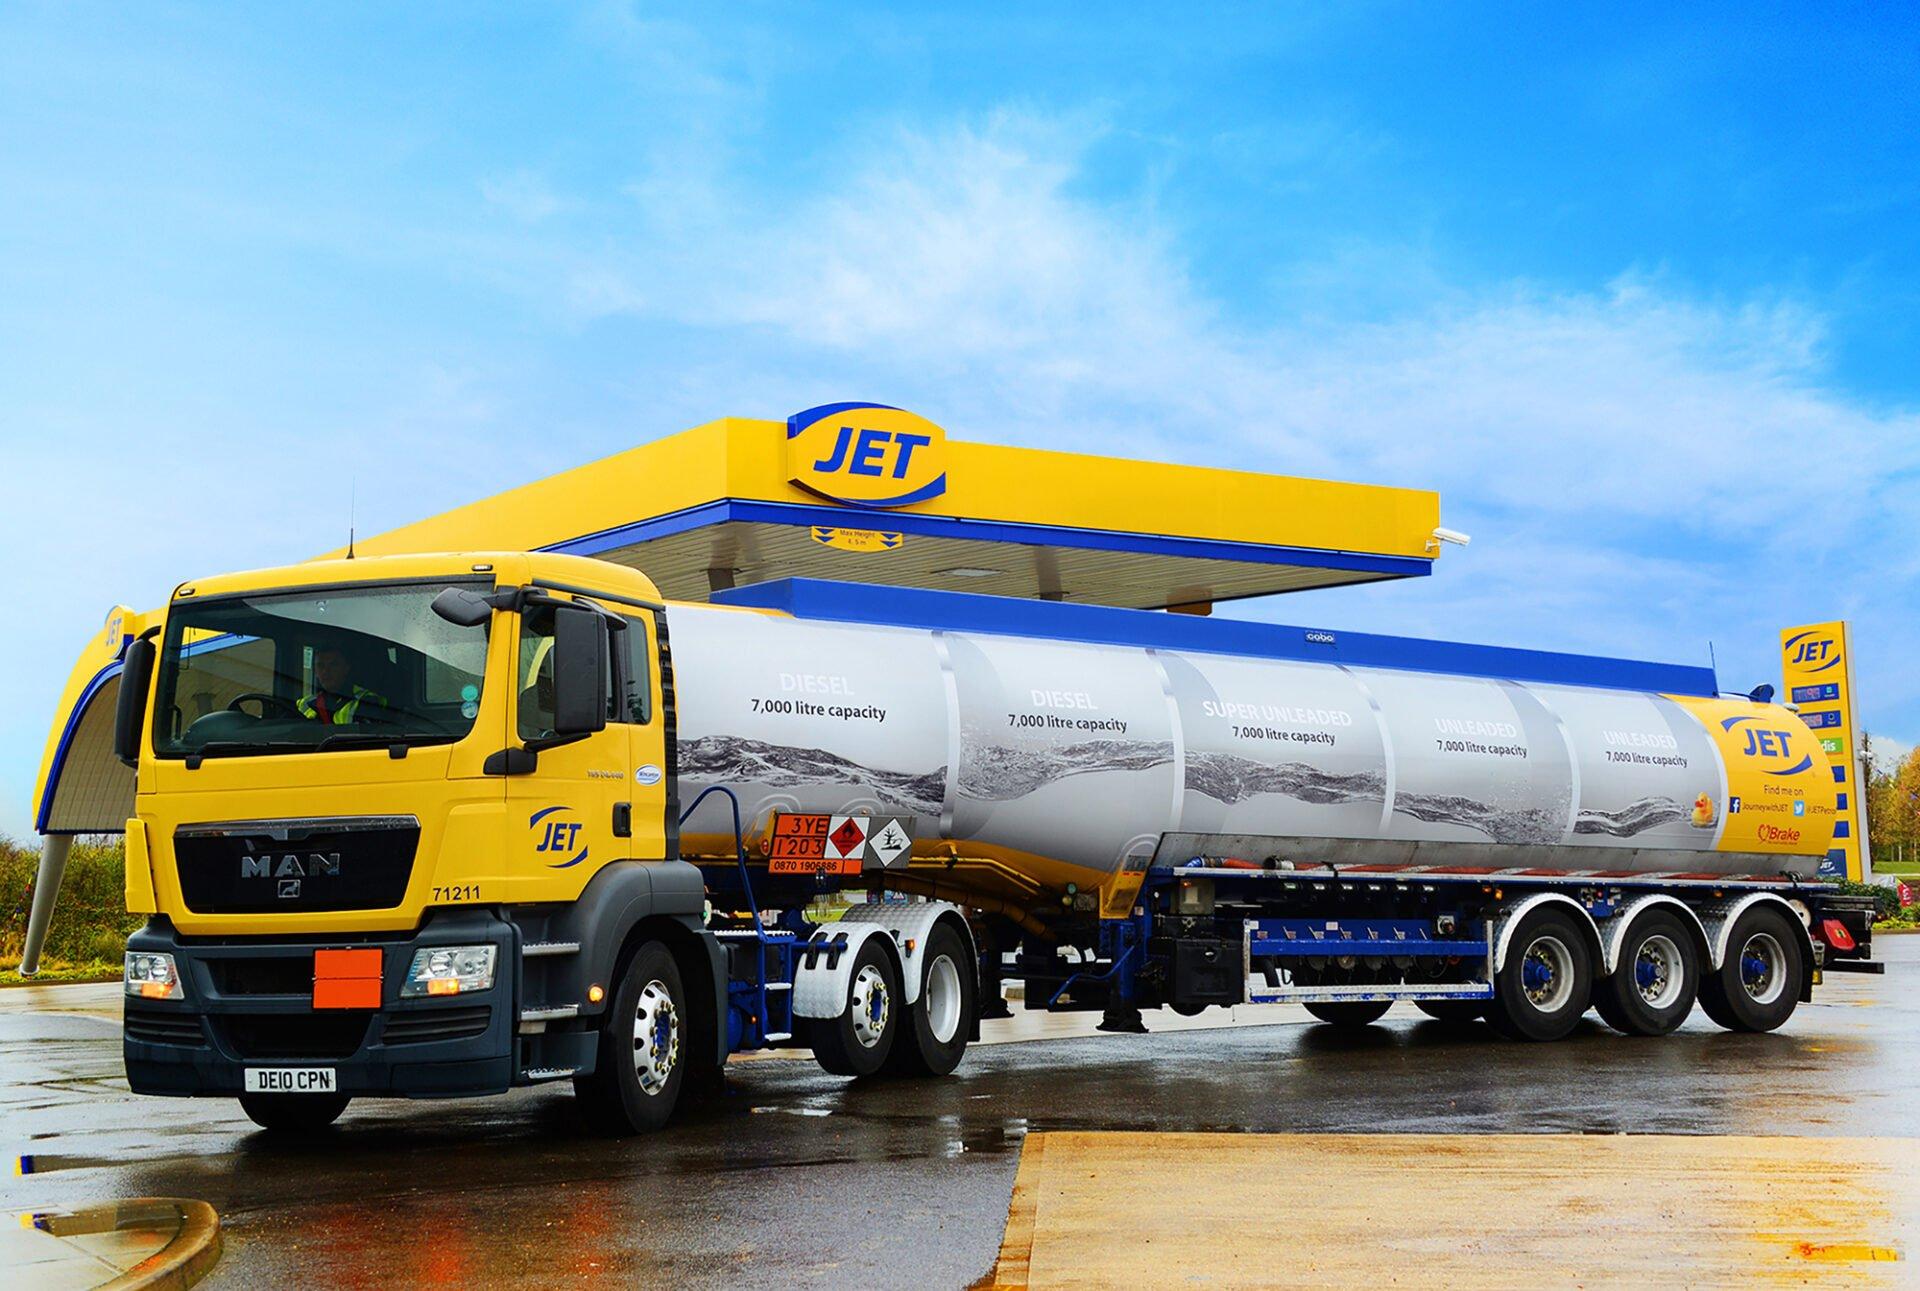 Photography-commercial-Birmingham - jet petrol tanker